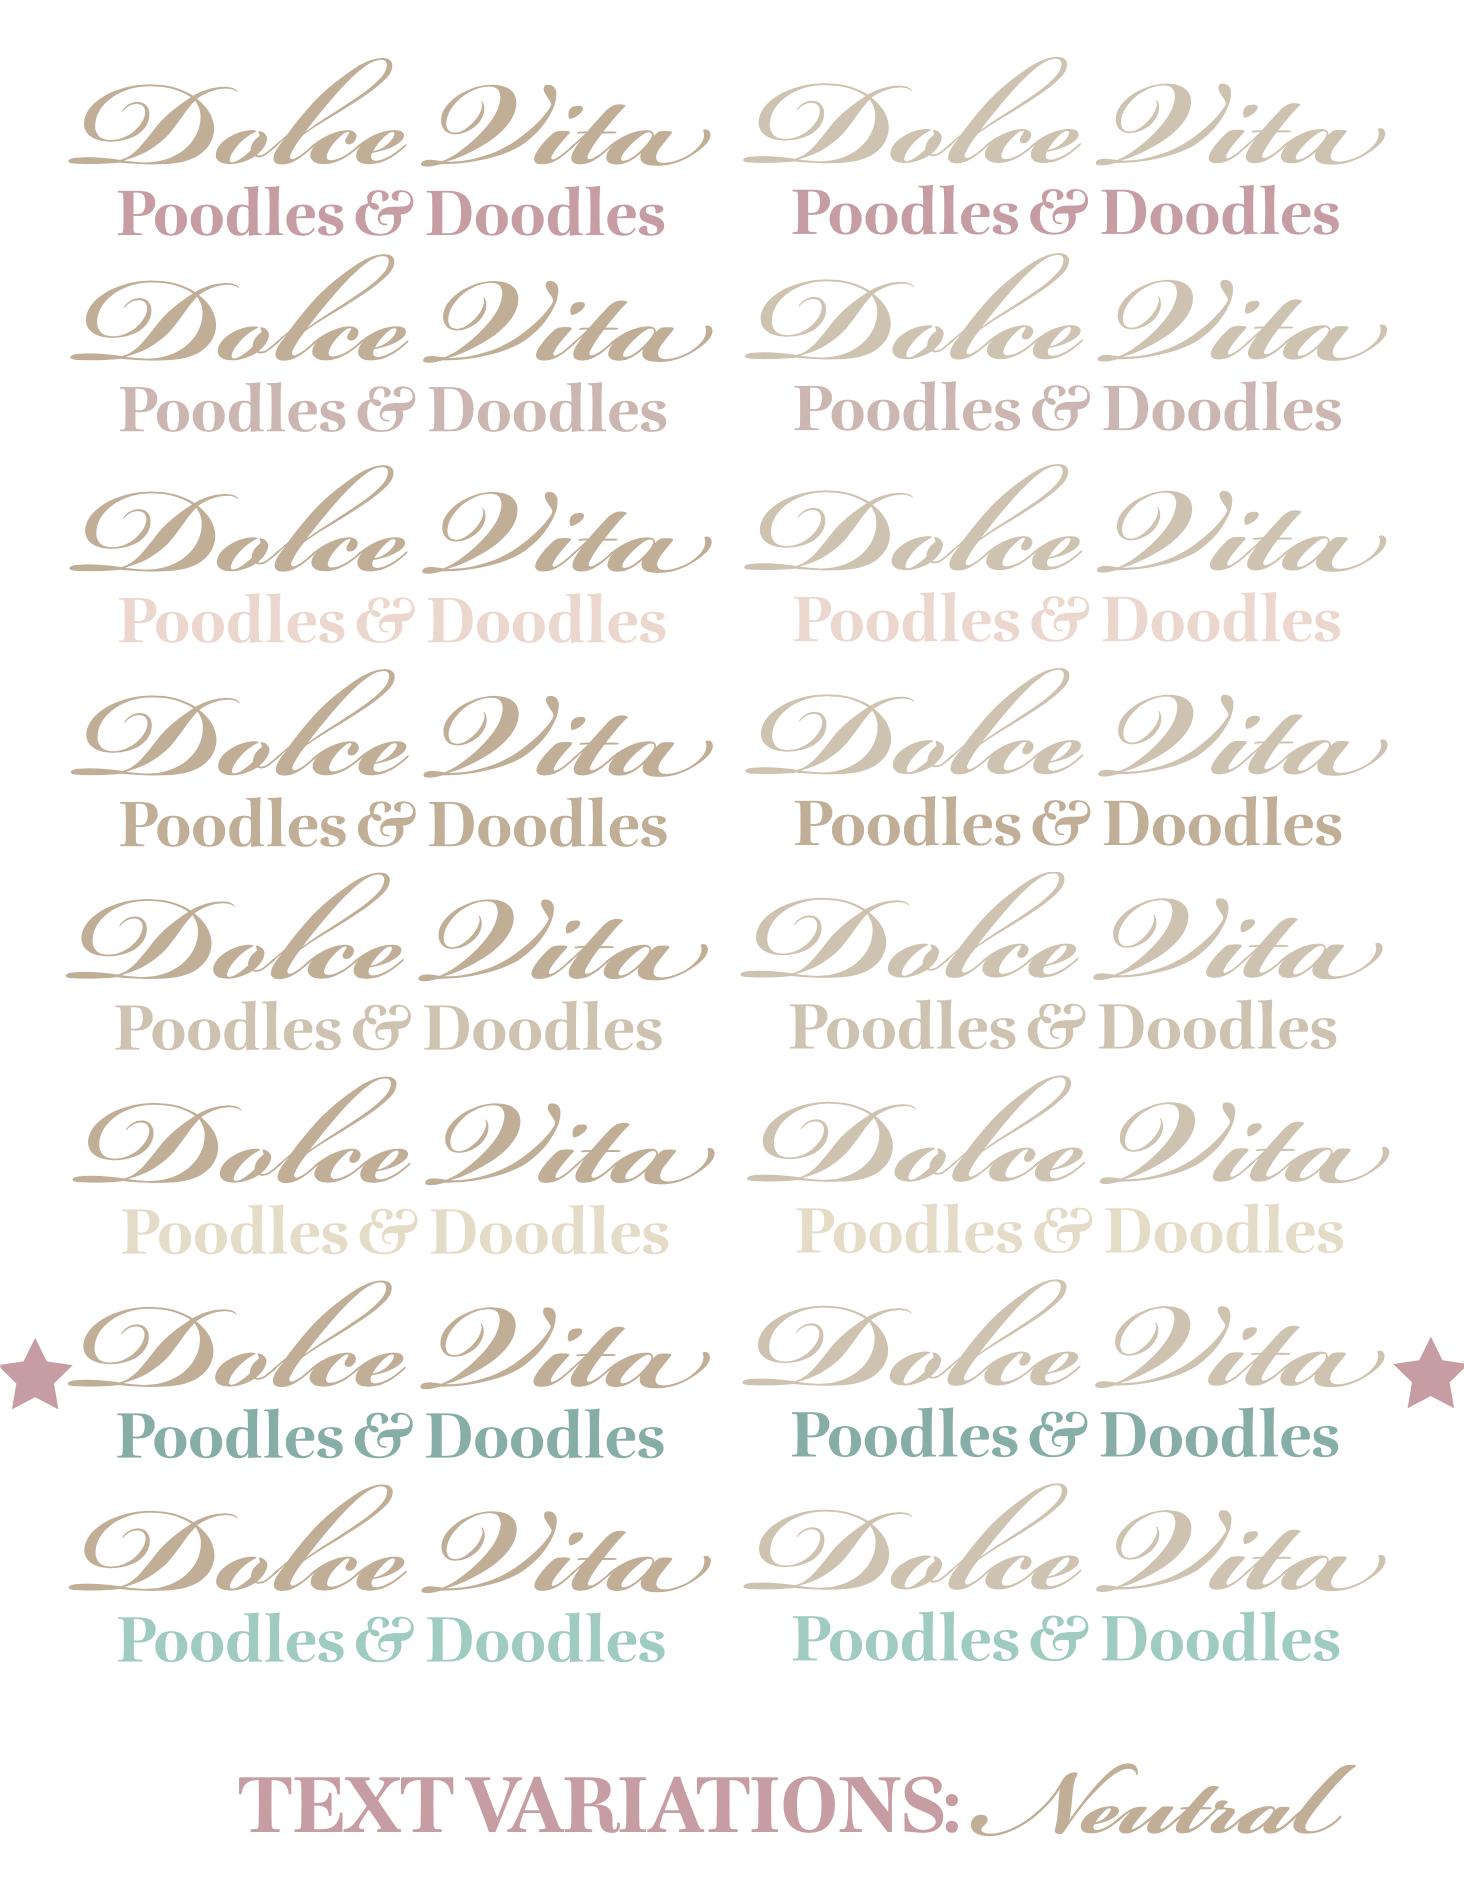 Dolce Vita Text Variations 3